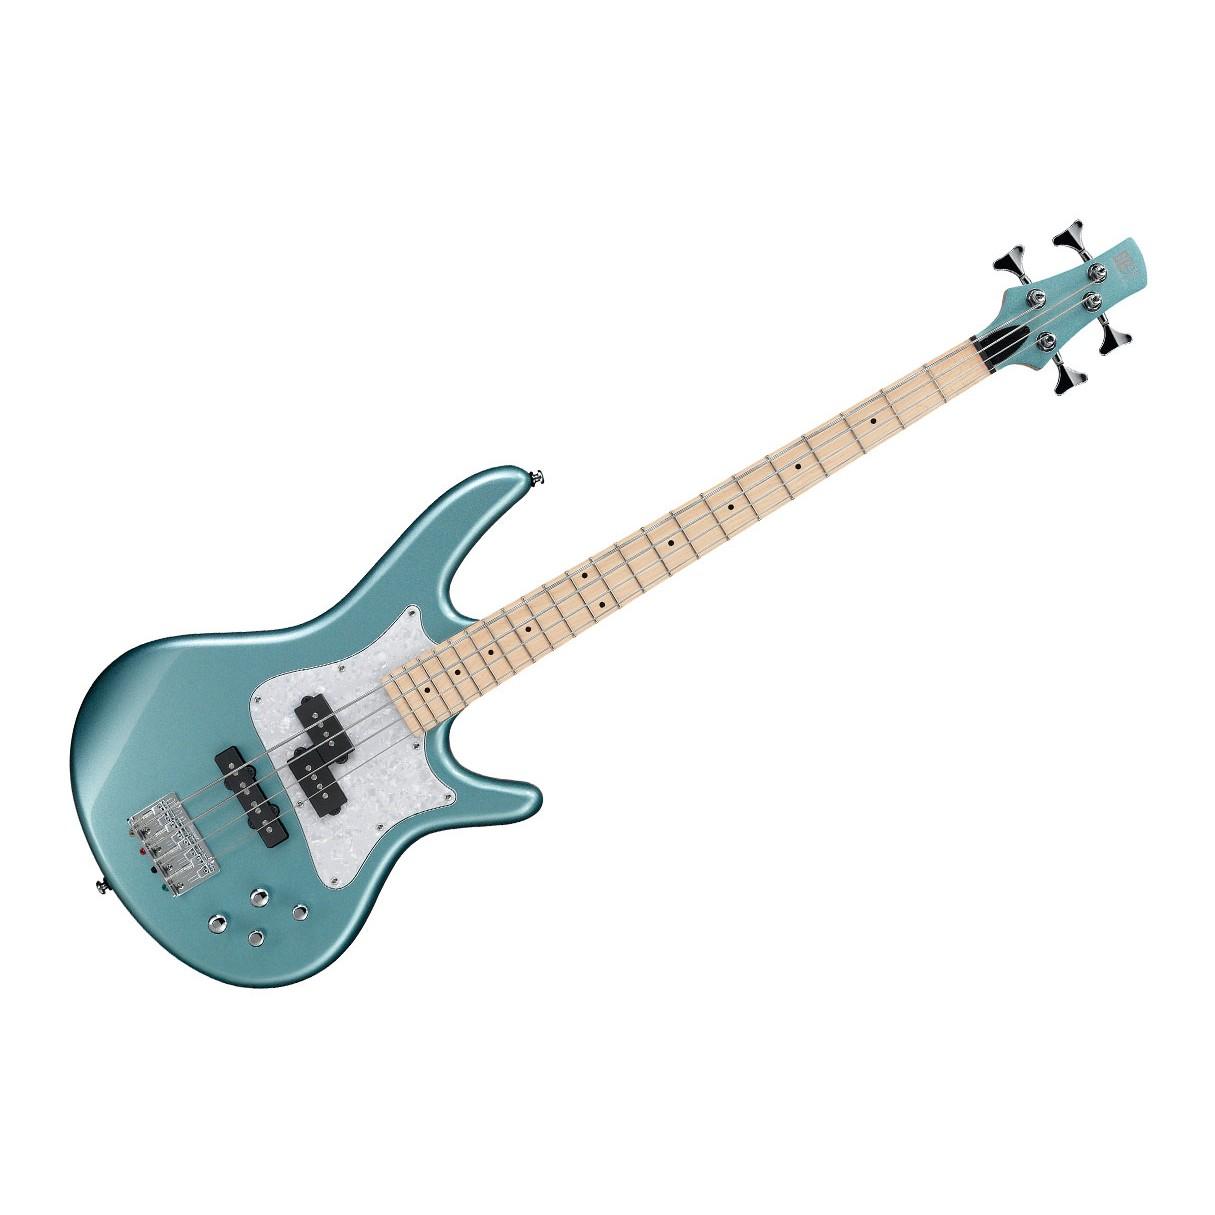 ibanez srmd200spn sr mezzo 4 string electric bass 32 scale sea foam pearl green. Black Bedroom Furniture Sets. Home Design Ideas